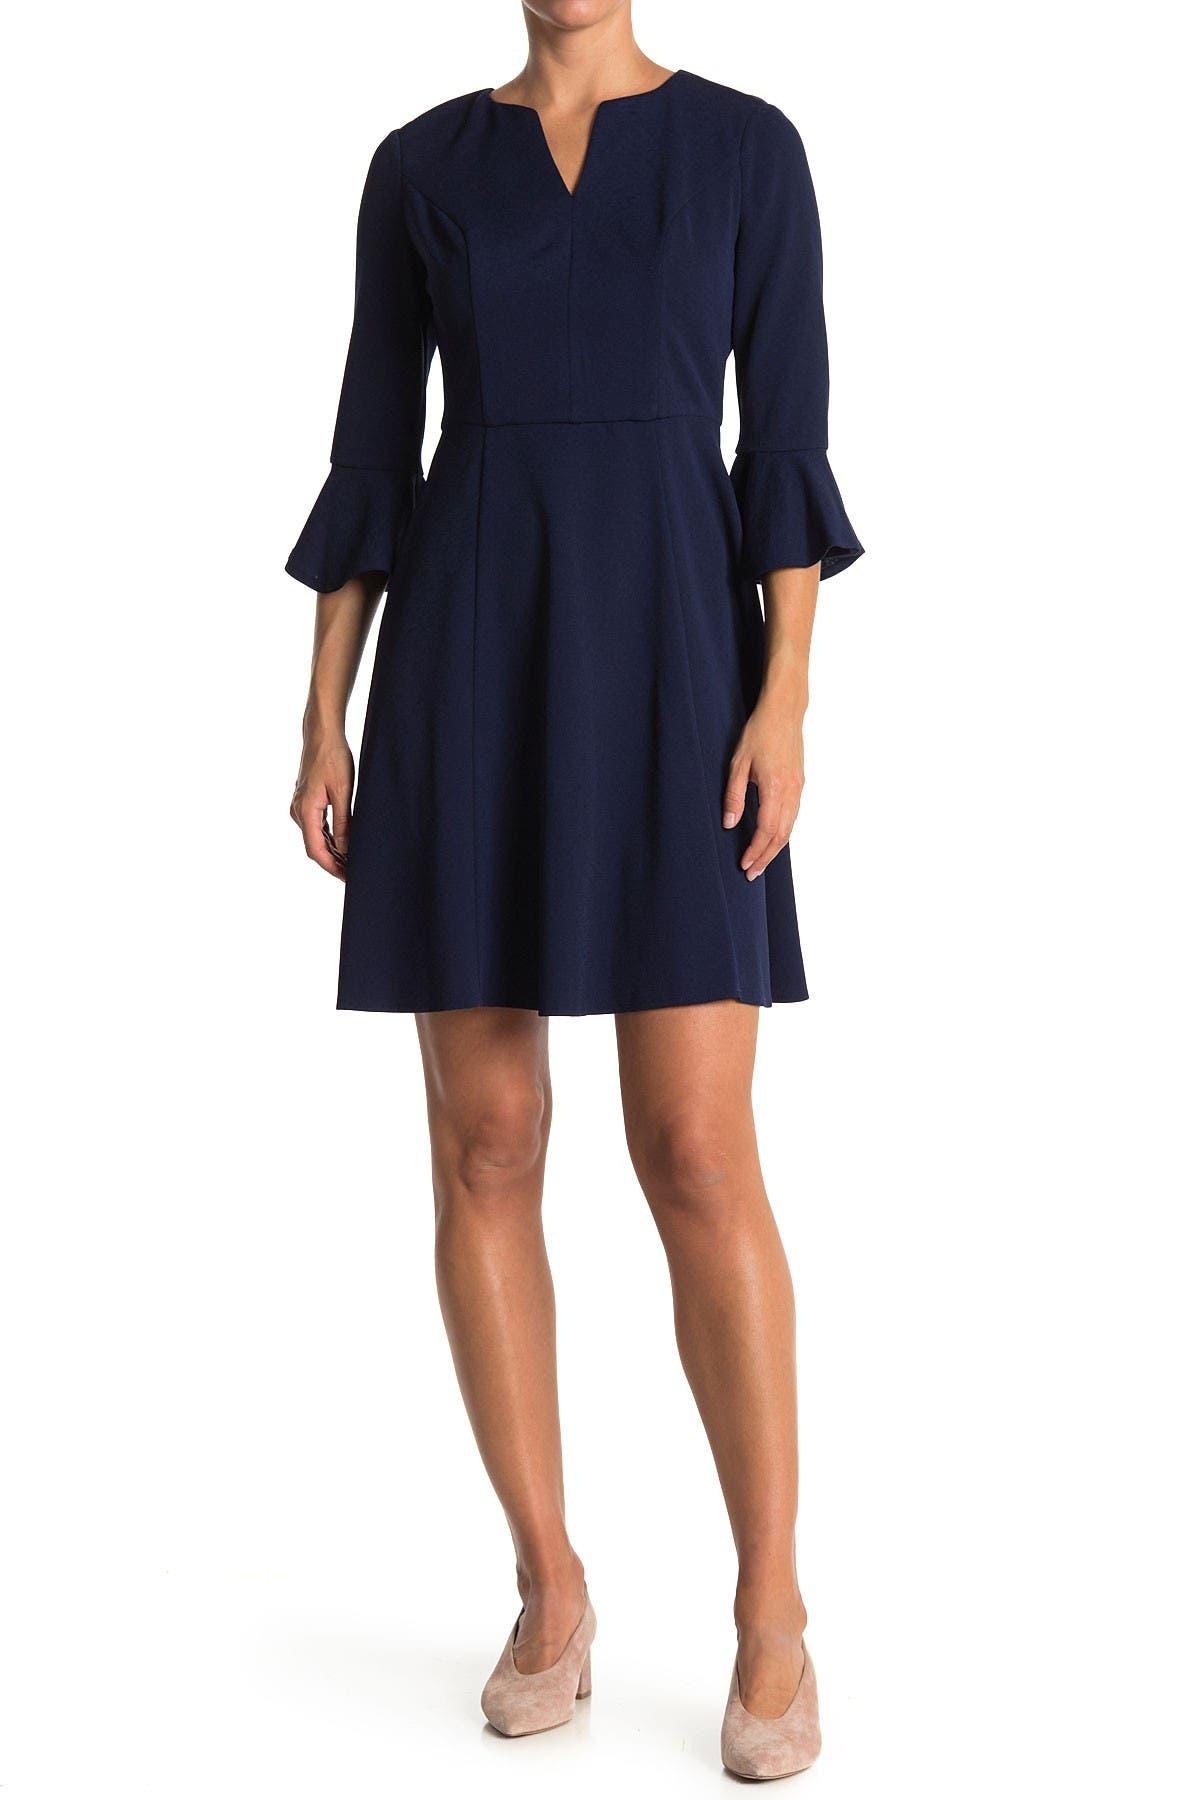 Image of London Times Ruffle Cuff Fit & Flare Dress